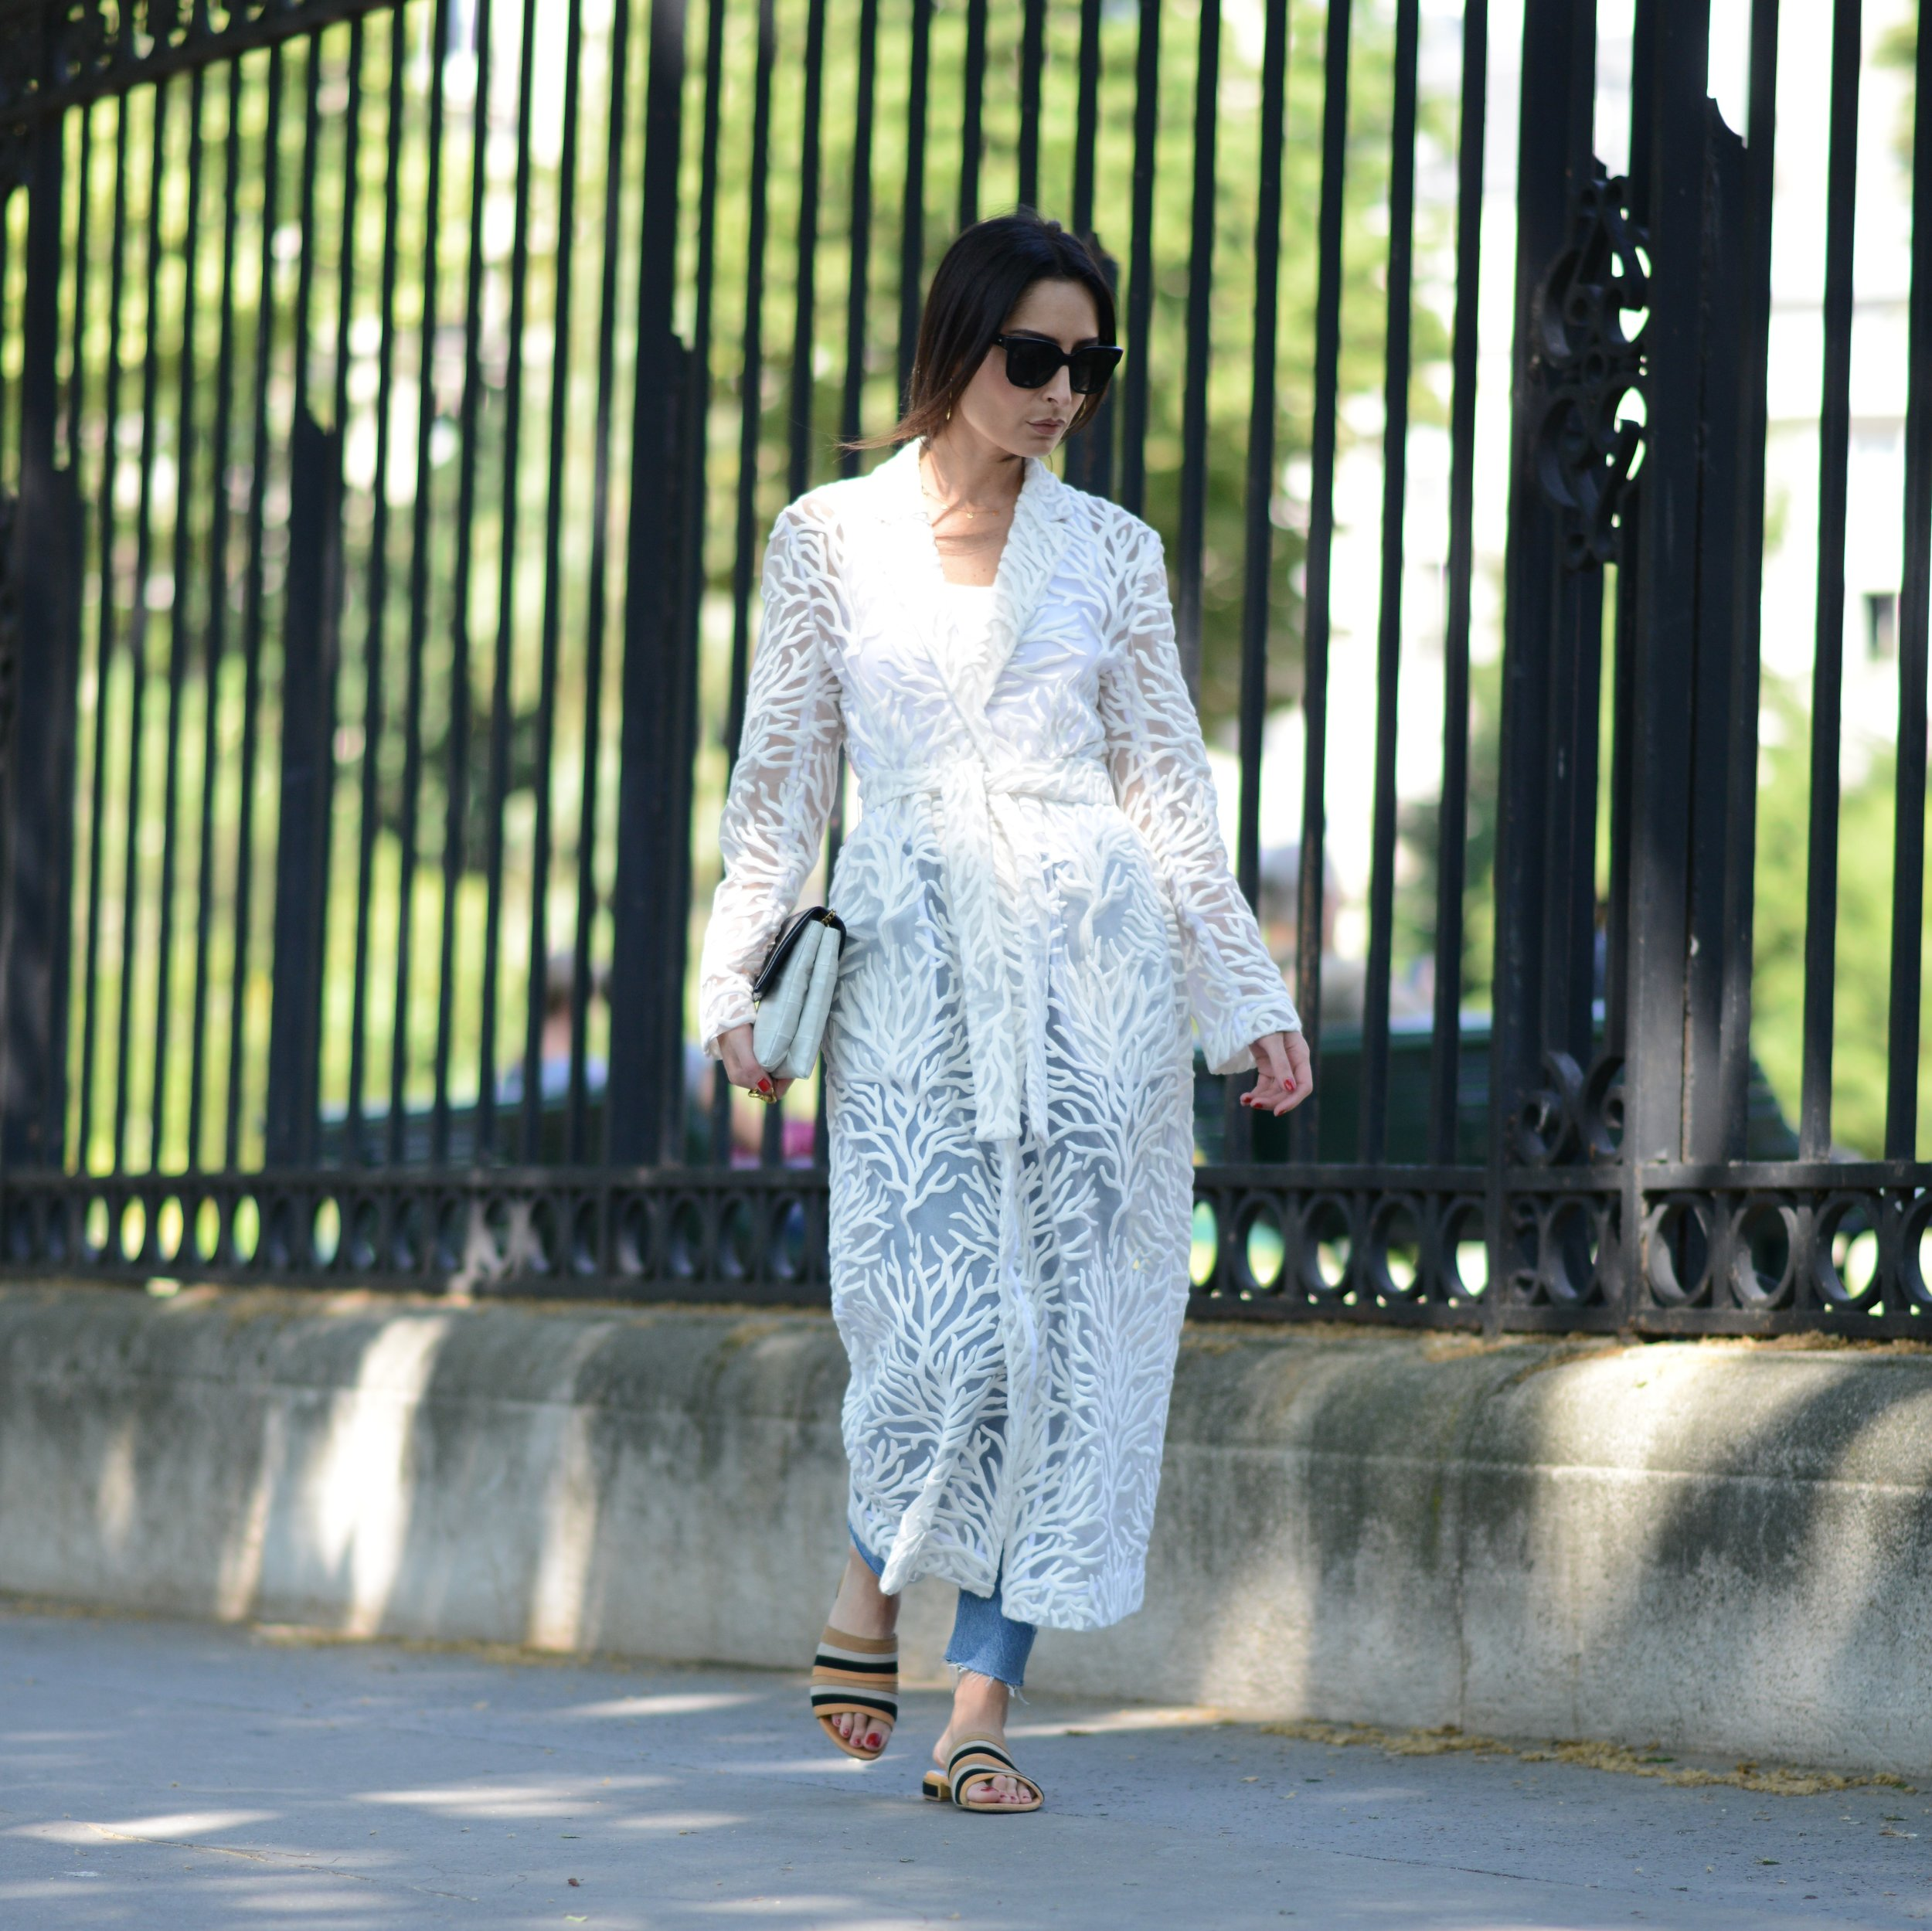 GERALDINE BOUBLIL - Velo de Coral Kimono  #shoedesigner #creative #erinadamson #almagirl #girlboss  @Jardin de Luxermbourg, Paris